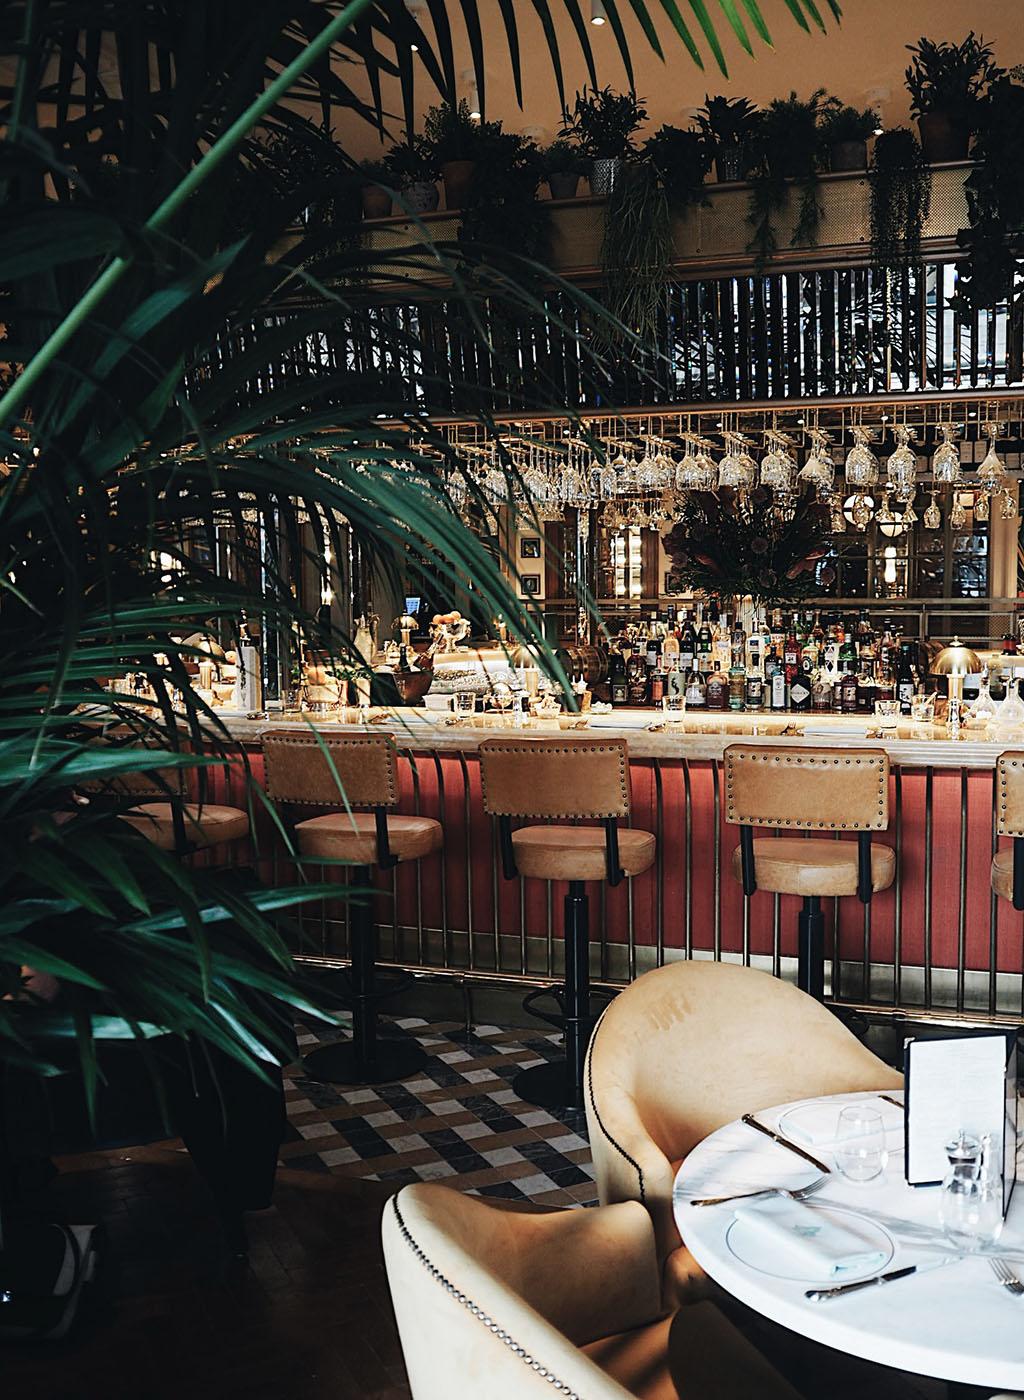 The Ivy In The Lanes, Brighton restaurant review www.lareesecraig.com brighton blogger Lareese Craig